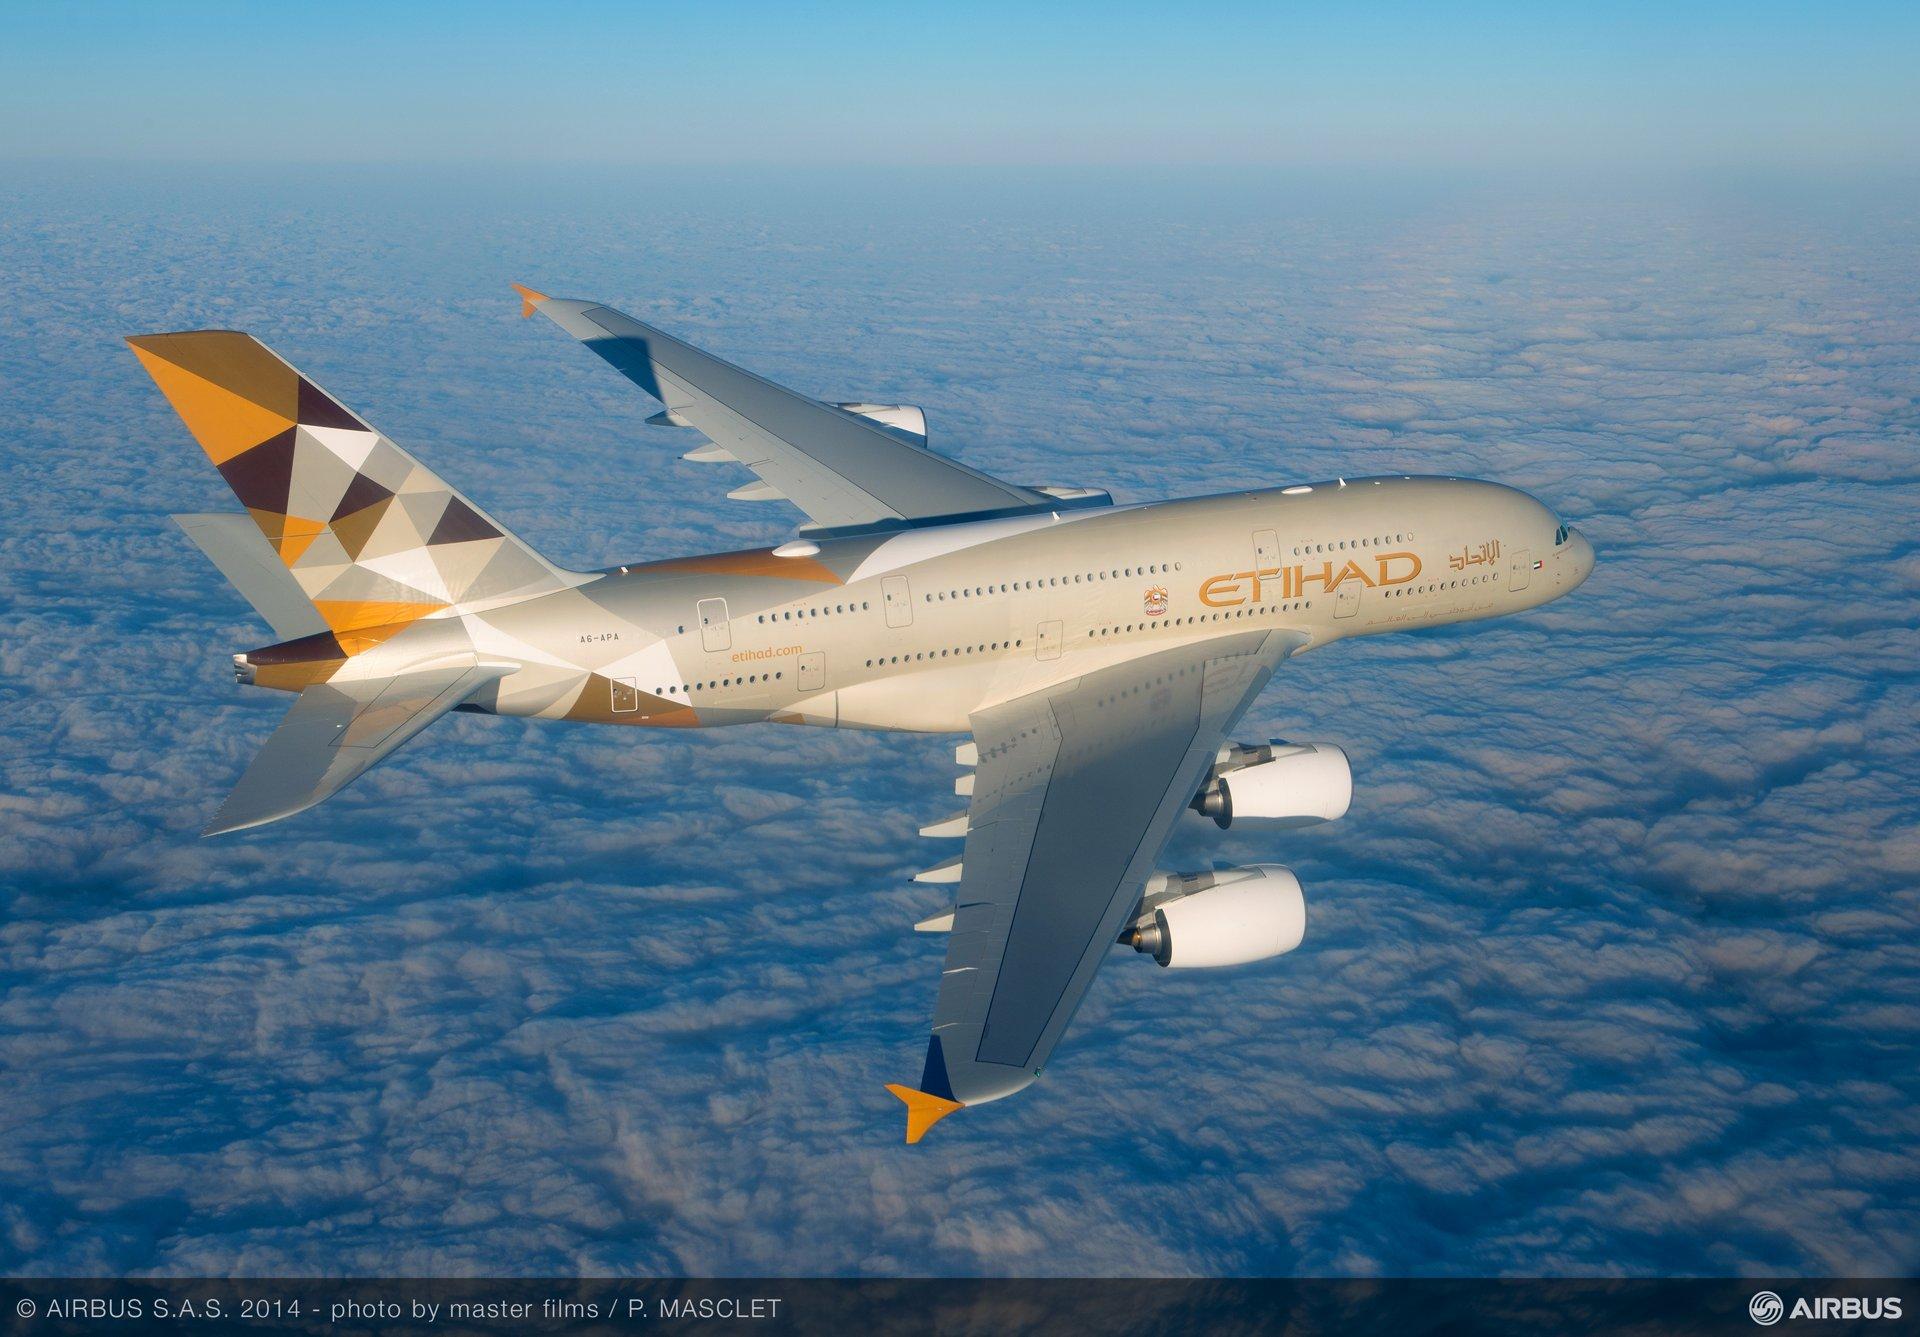 A380 Etihad - In flight 1